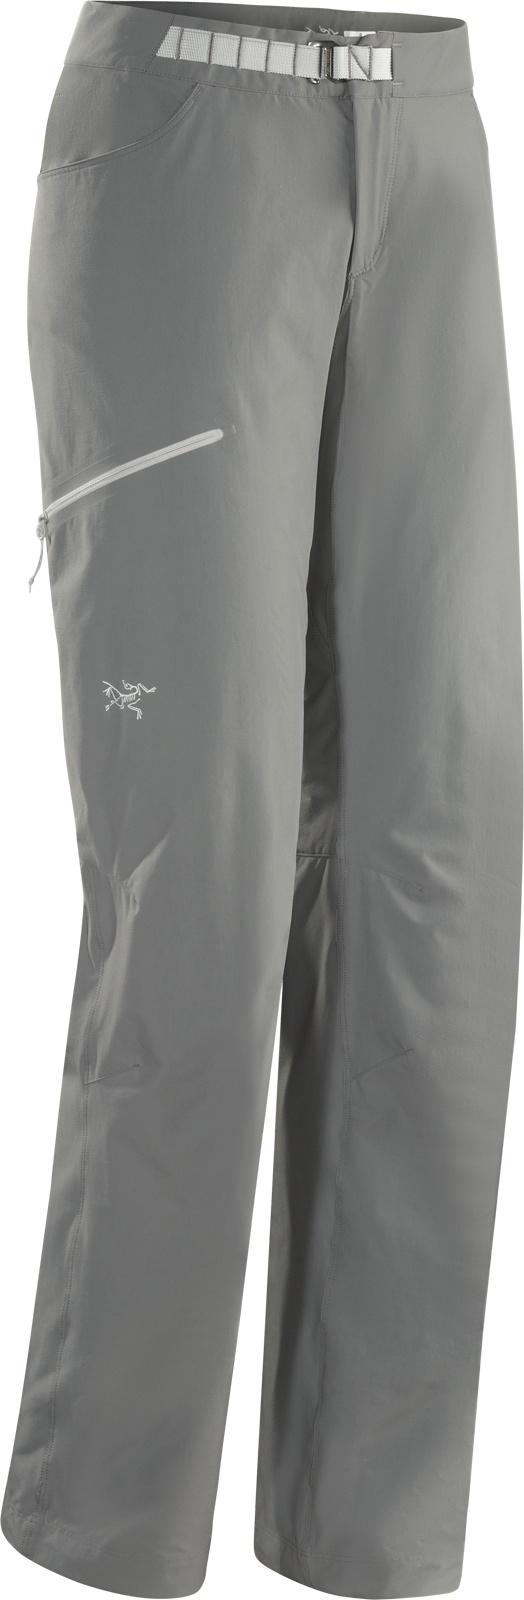 Arcteryx Psiphon SL Pant Women's Sterling Silver-30